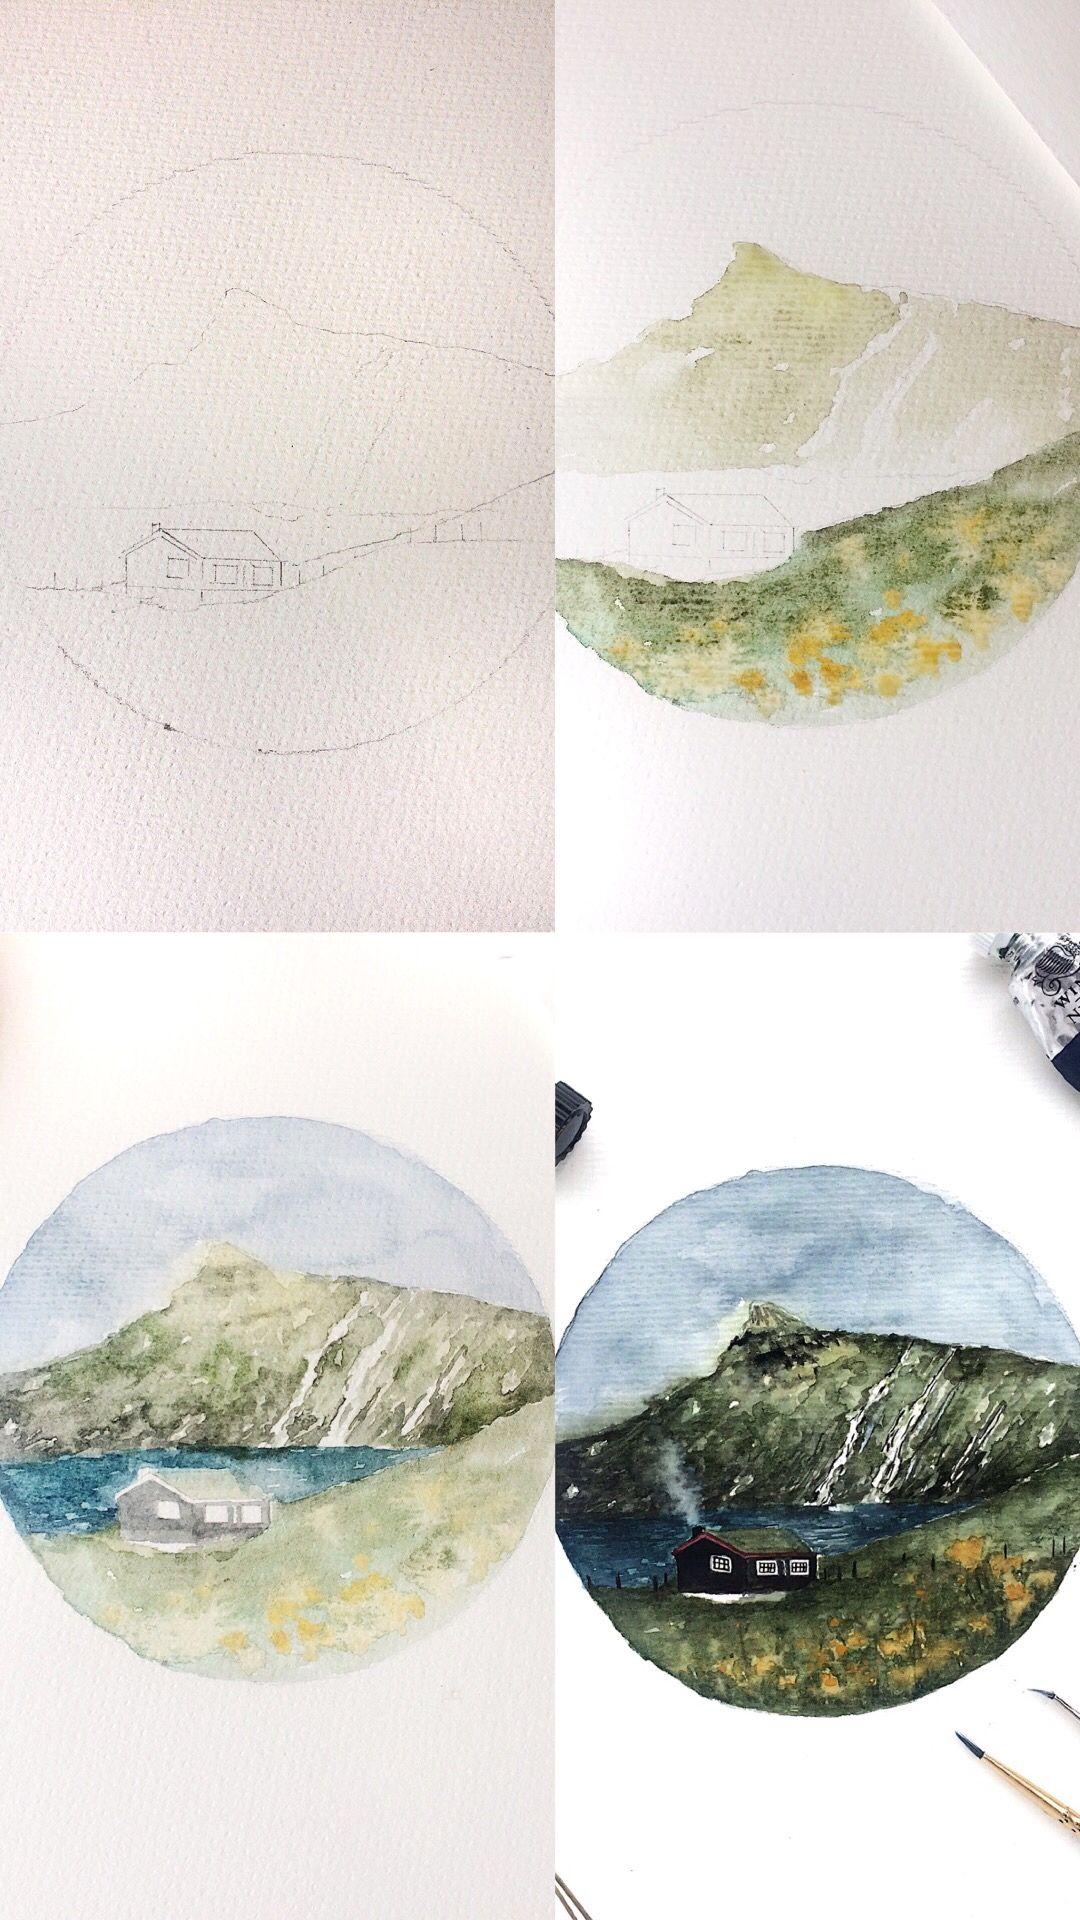 Rosies Sketchbook Watercolor Painting Process Photos Watercolor